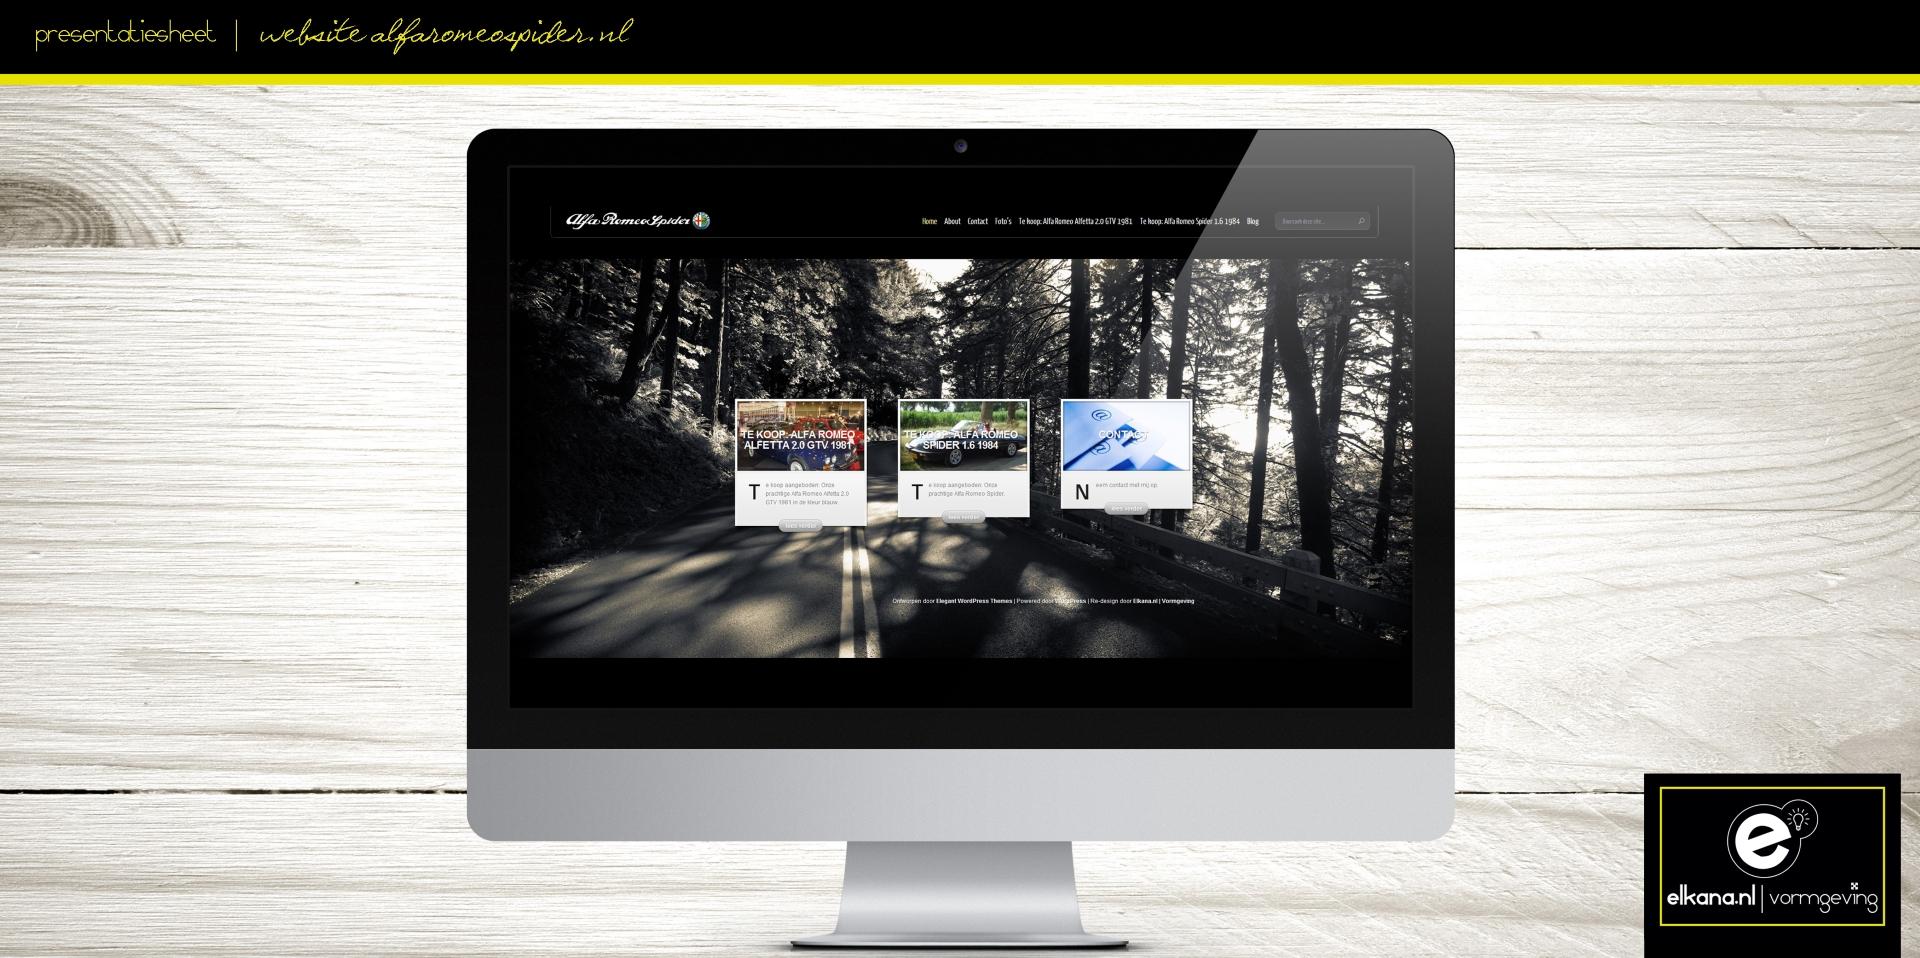 Website AlfaRomeoSpider.nl